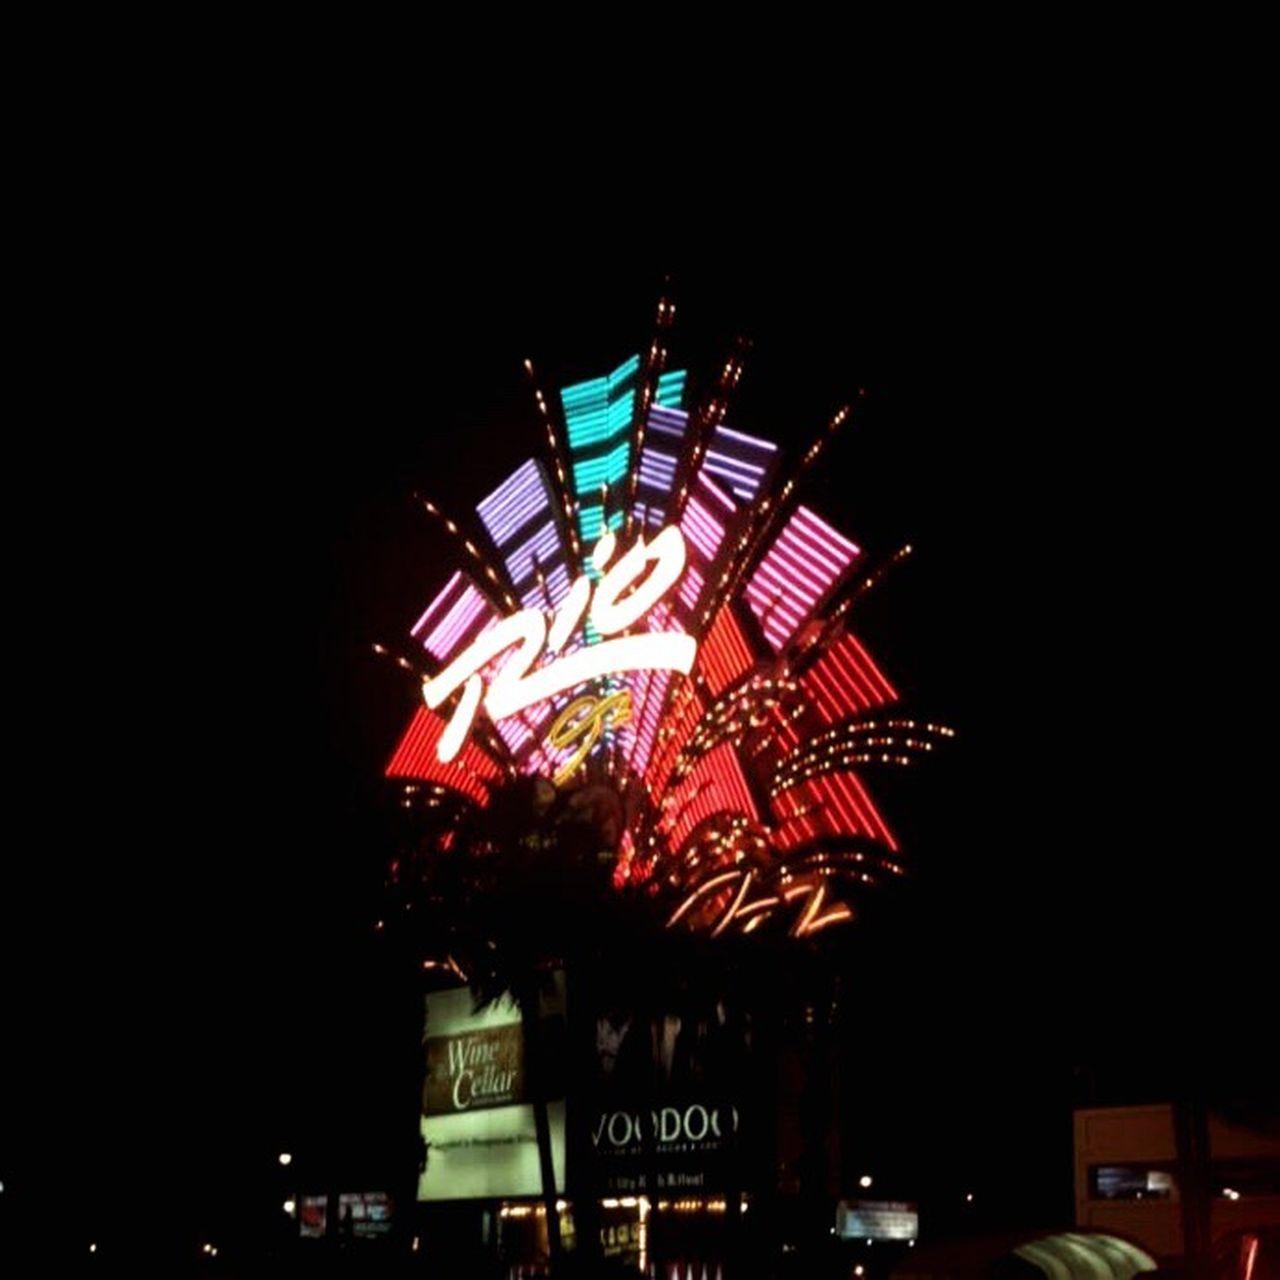 Rio Hotel and Casino Nightlife Arts Culture And Entertainment Neon First Eyeem Photo Casino Las Vegas Hotel Sign Entertainment Gamble Nevada